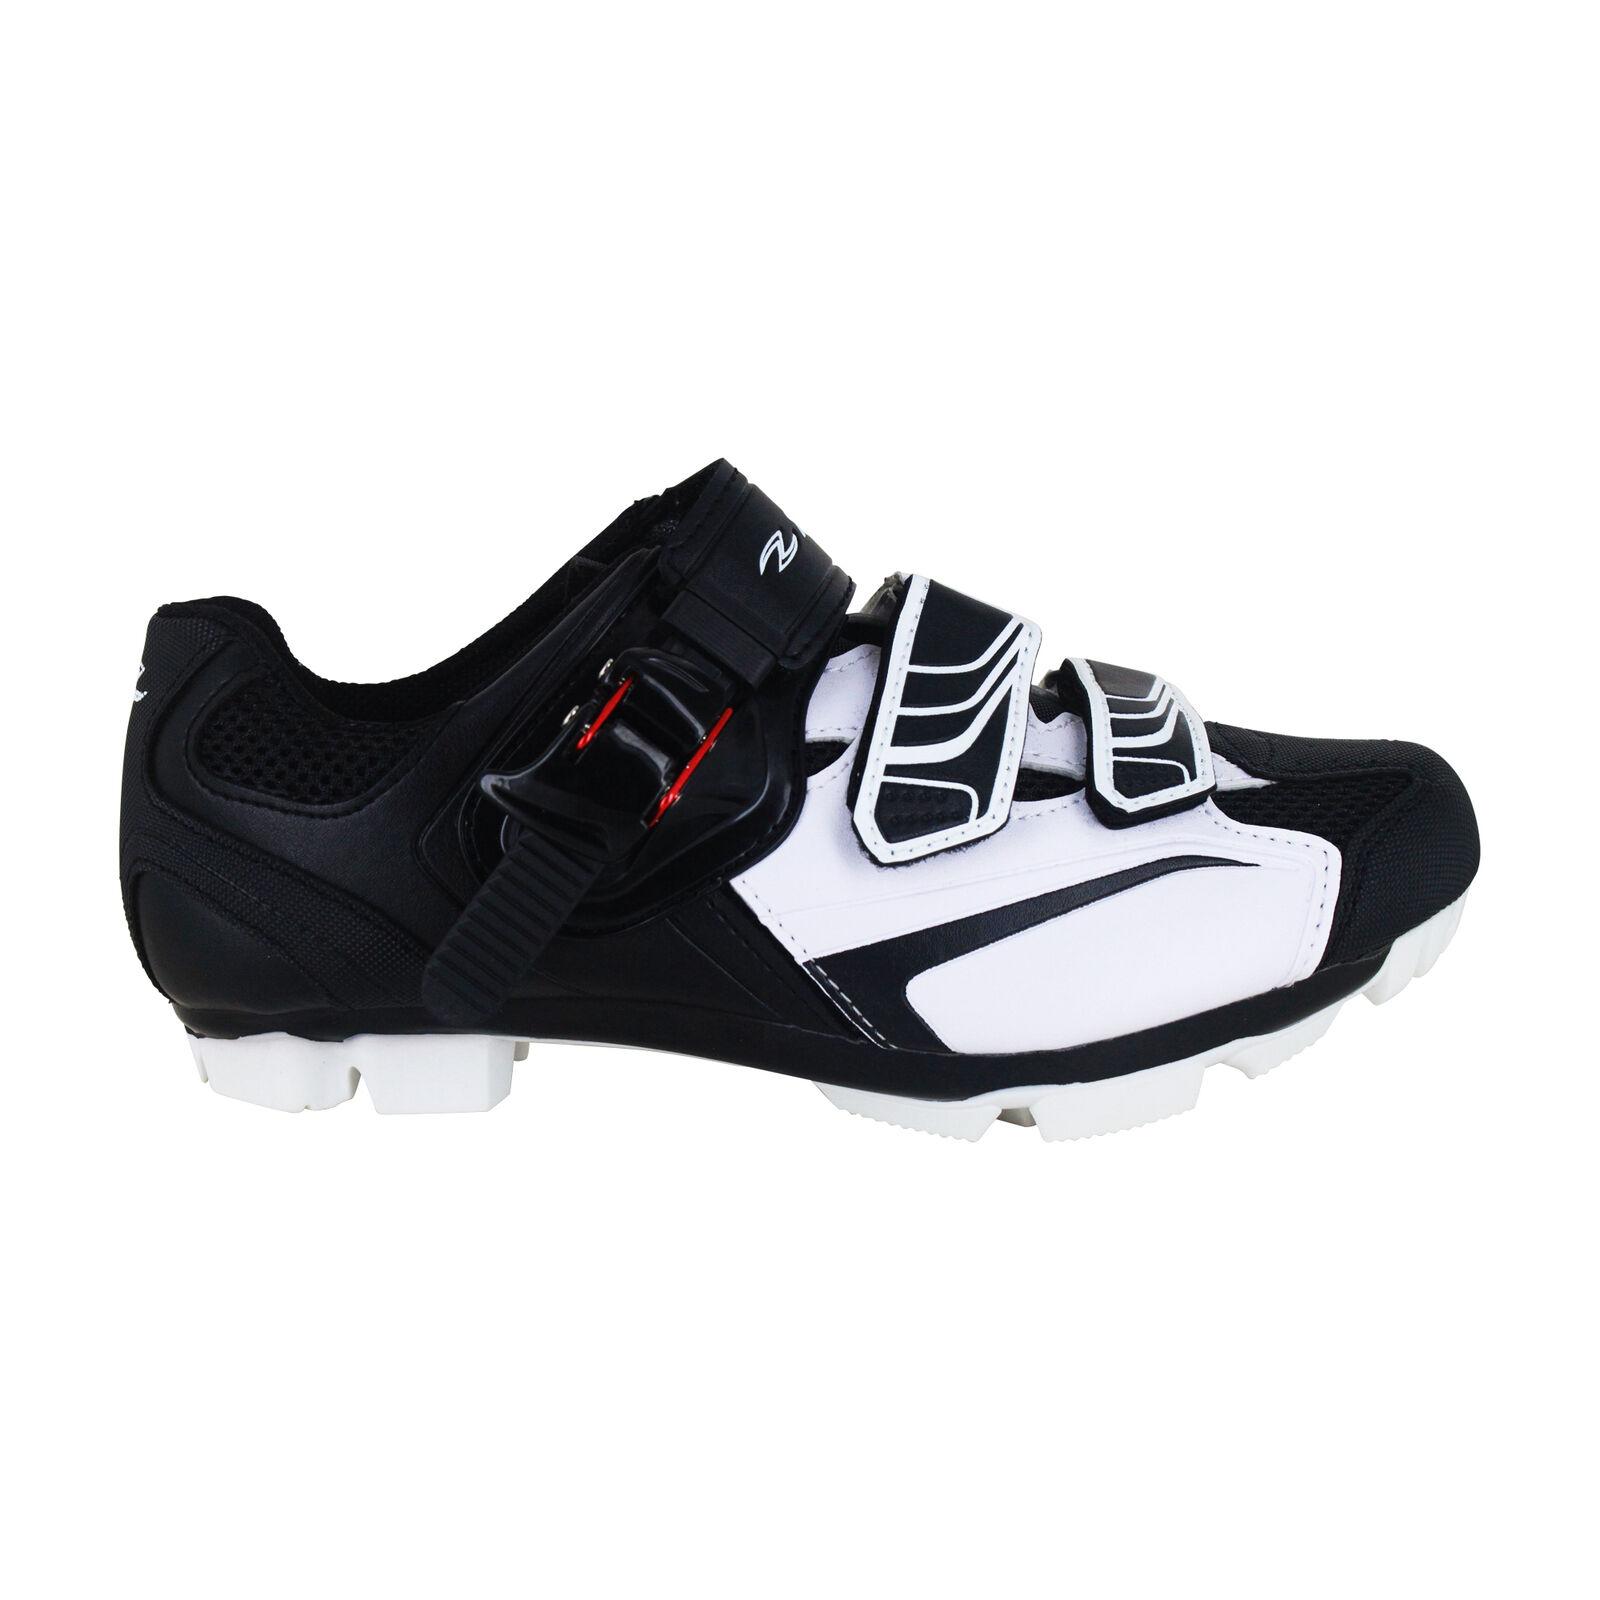 Zol bianca MTB Indoor Cycling scarpe